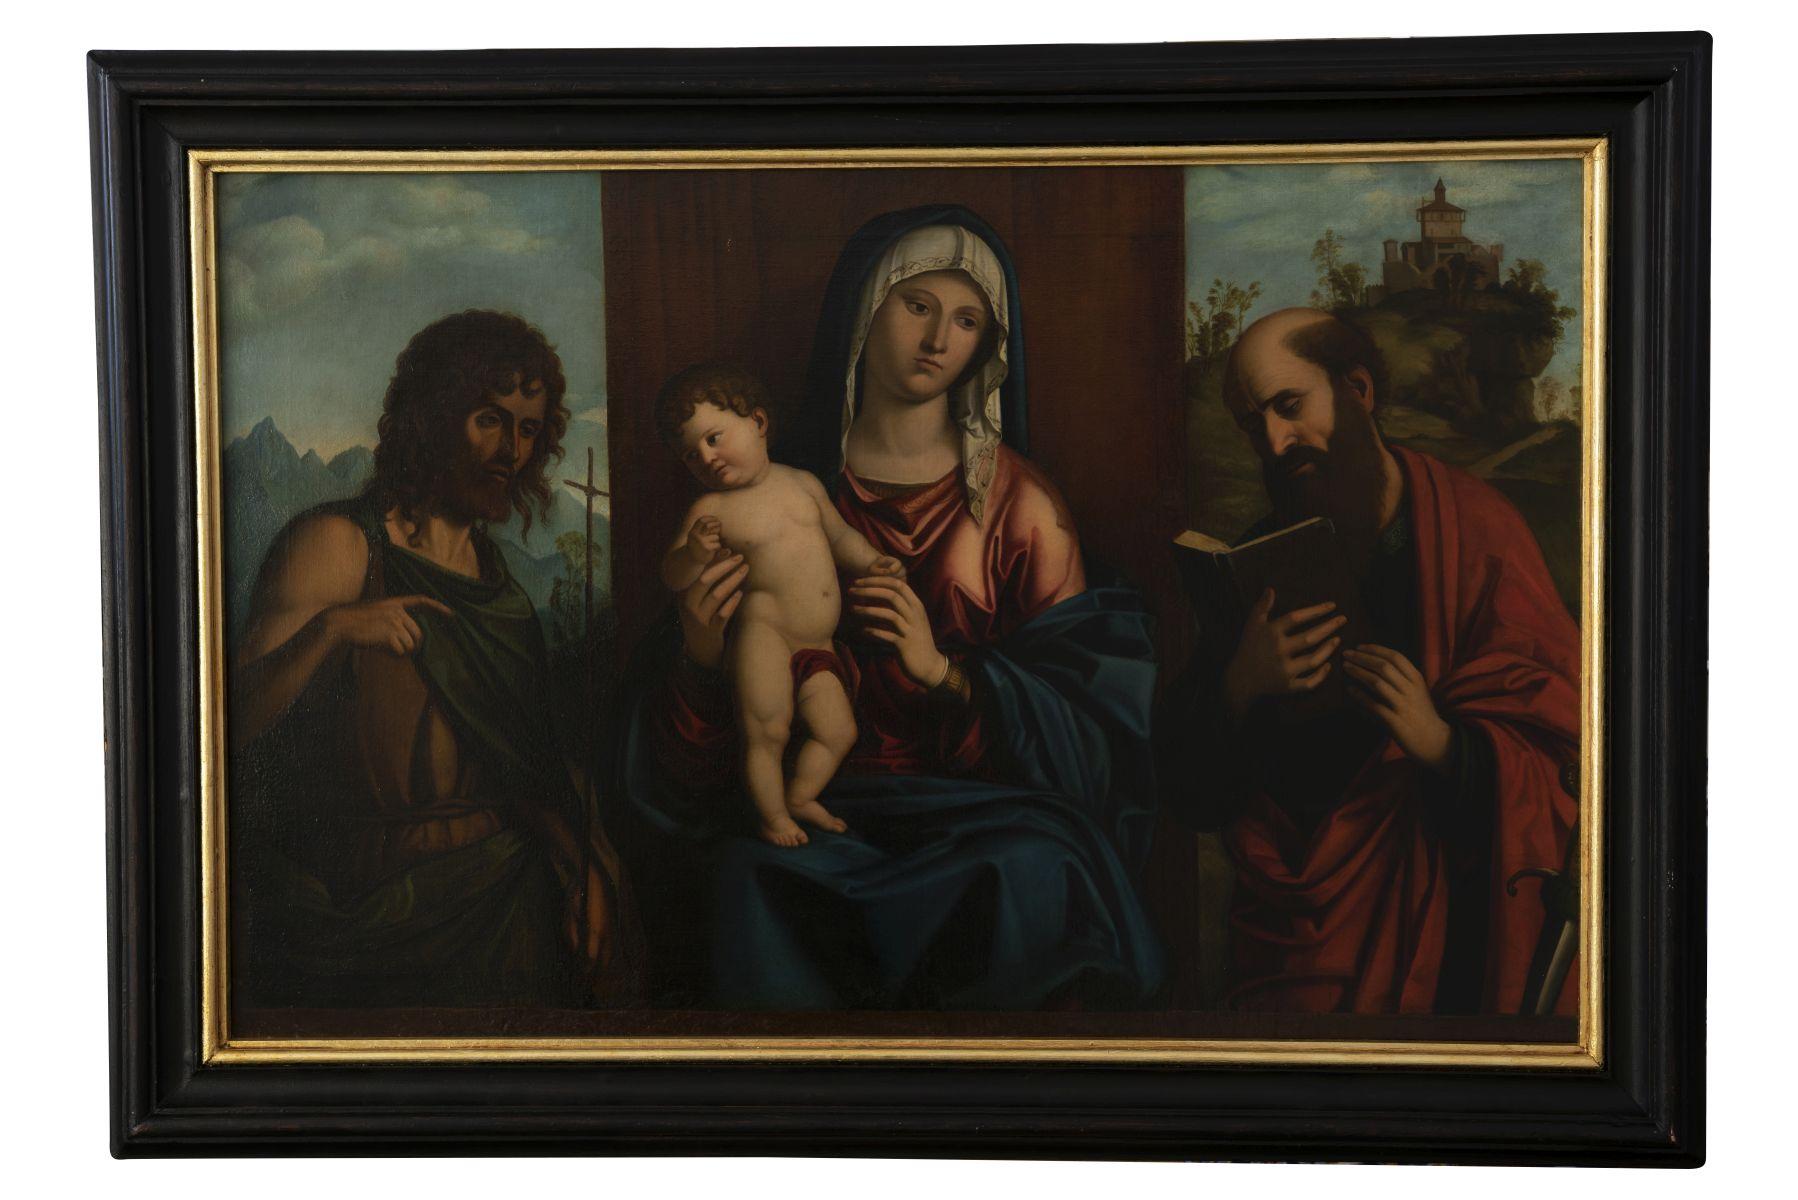 "#120 Giovanni Battista Cima Successor ""Madonna and Child, St. Paul and John the Baptist"" | Giovanni Battista Cima Nachfolger ""Madonna mit Kind, dem Hl. Paulus und Johannes der Täufer"" Image"